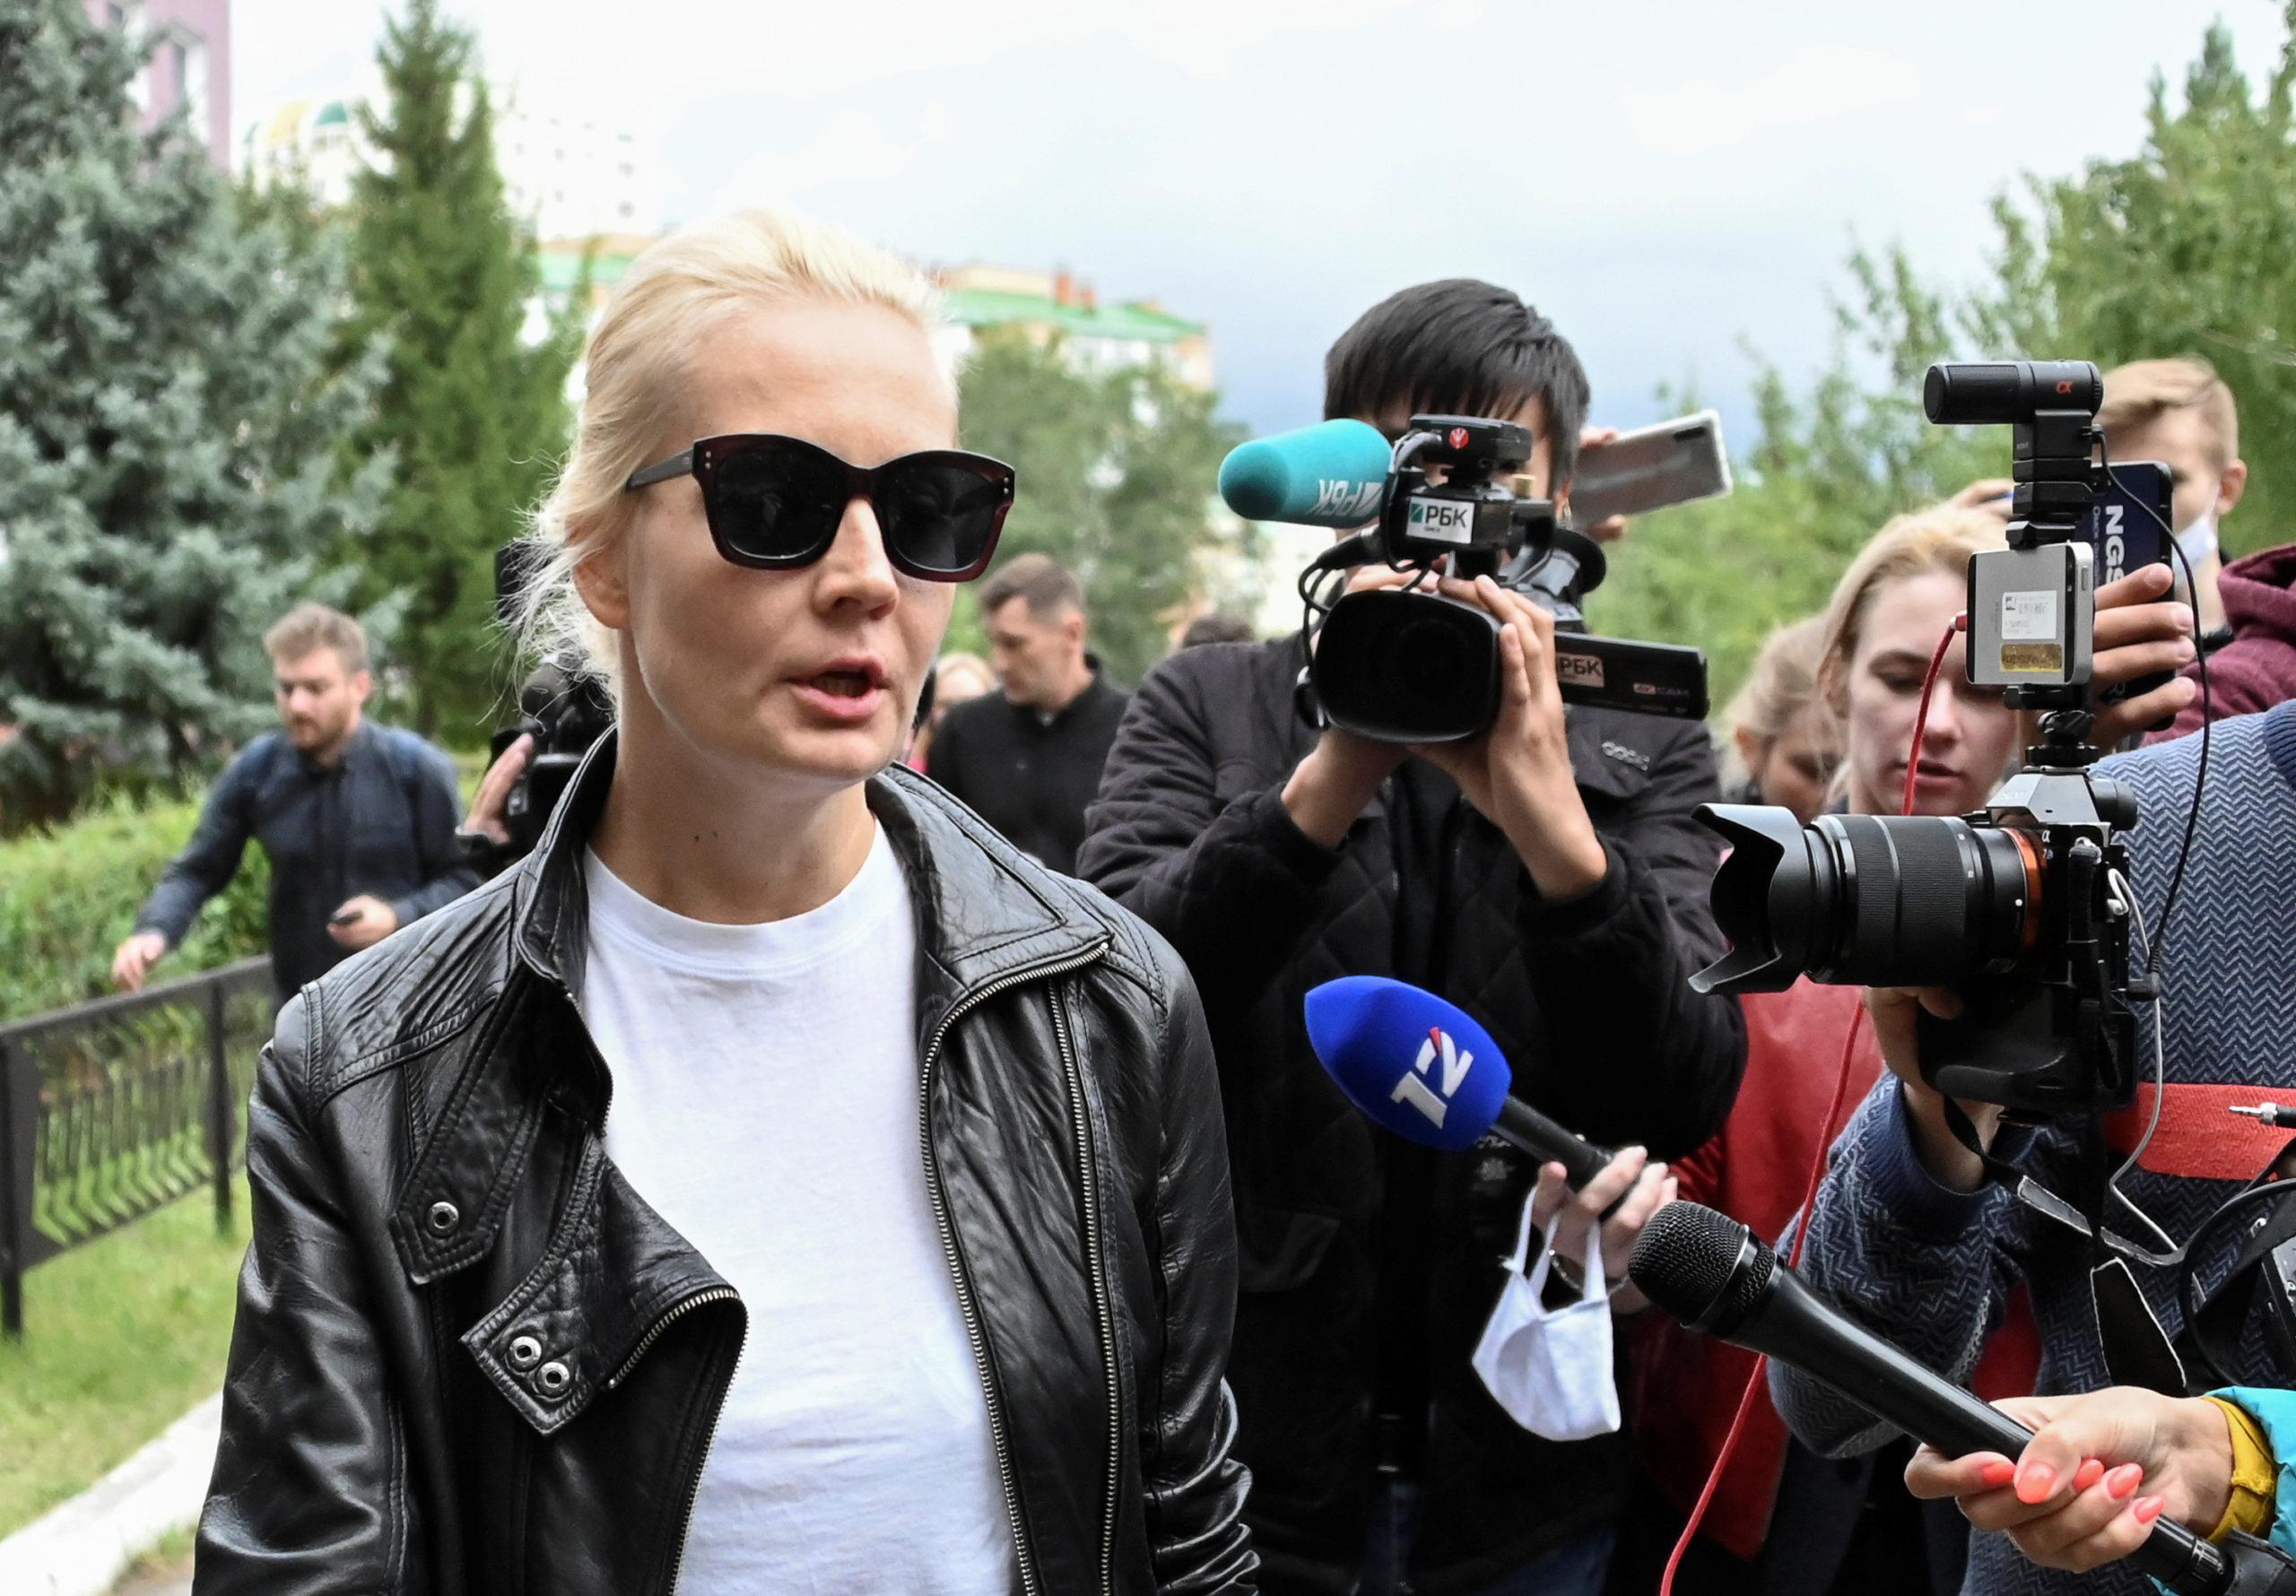 Yulia Navalnaya demande à Vladimir Poutine d'autoriser le transfert d'Alexeï Navalny en Allemagne